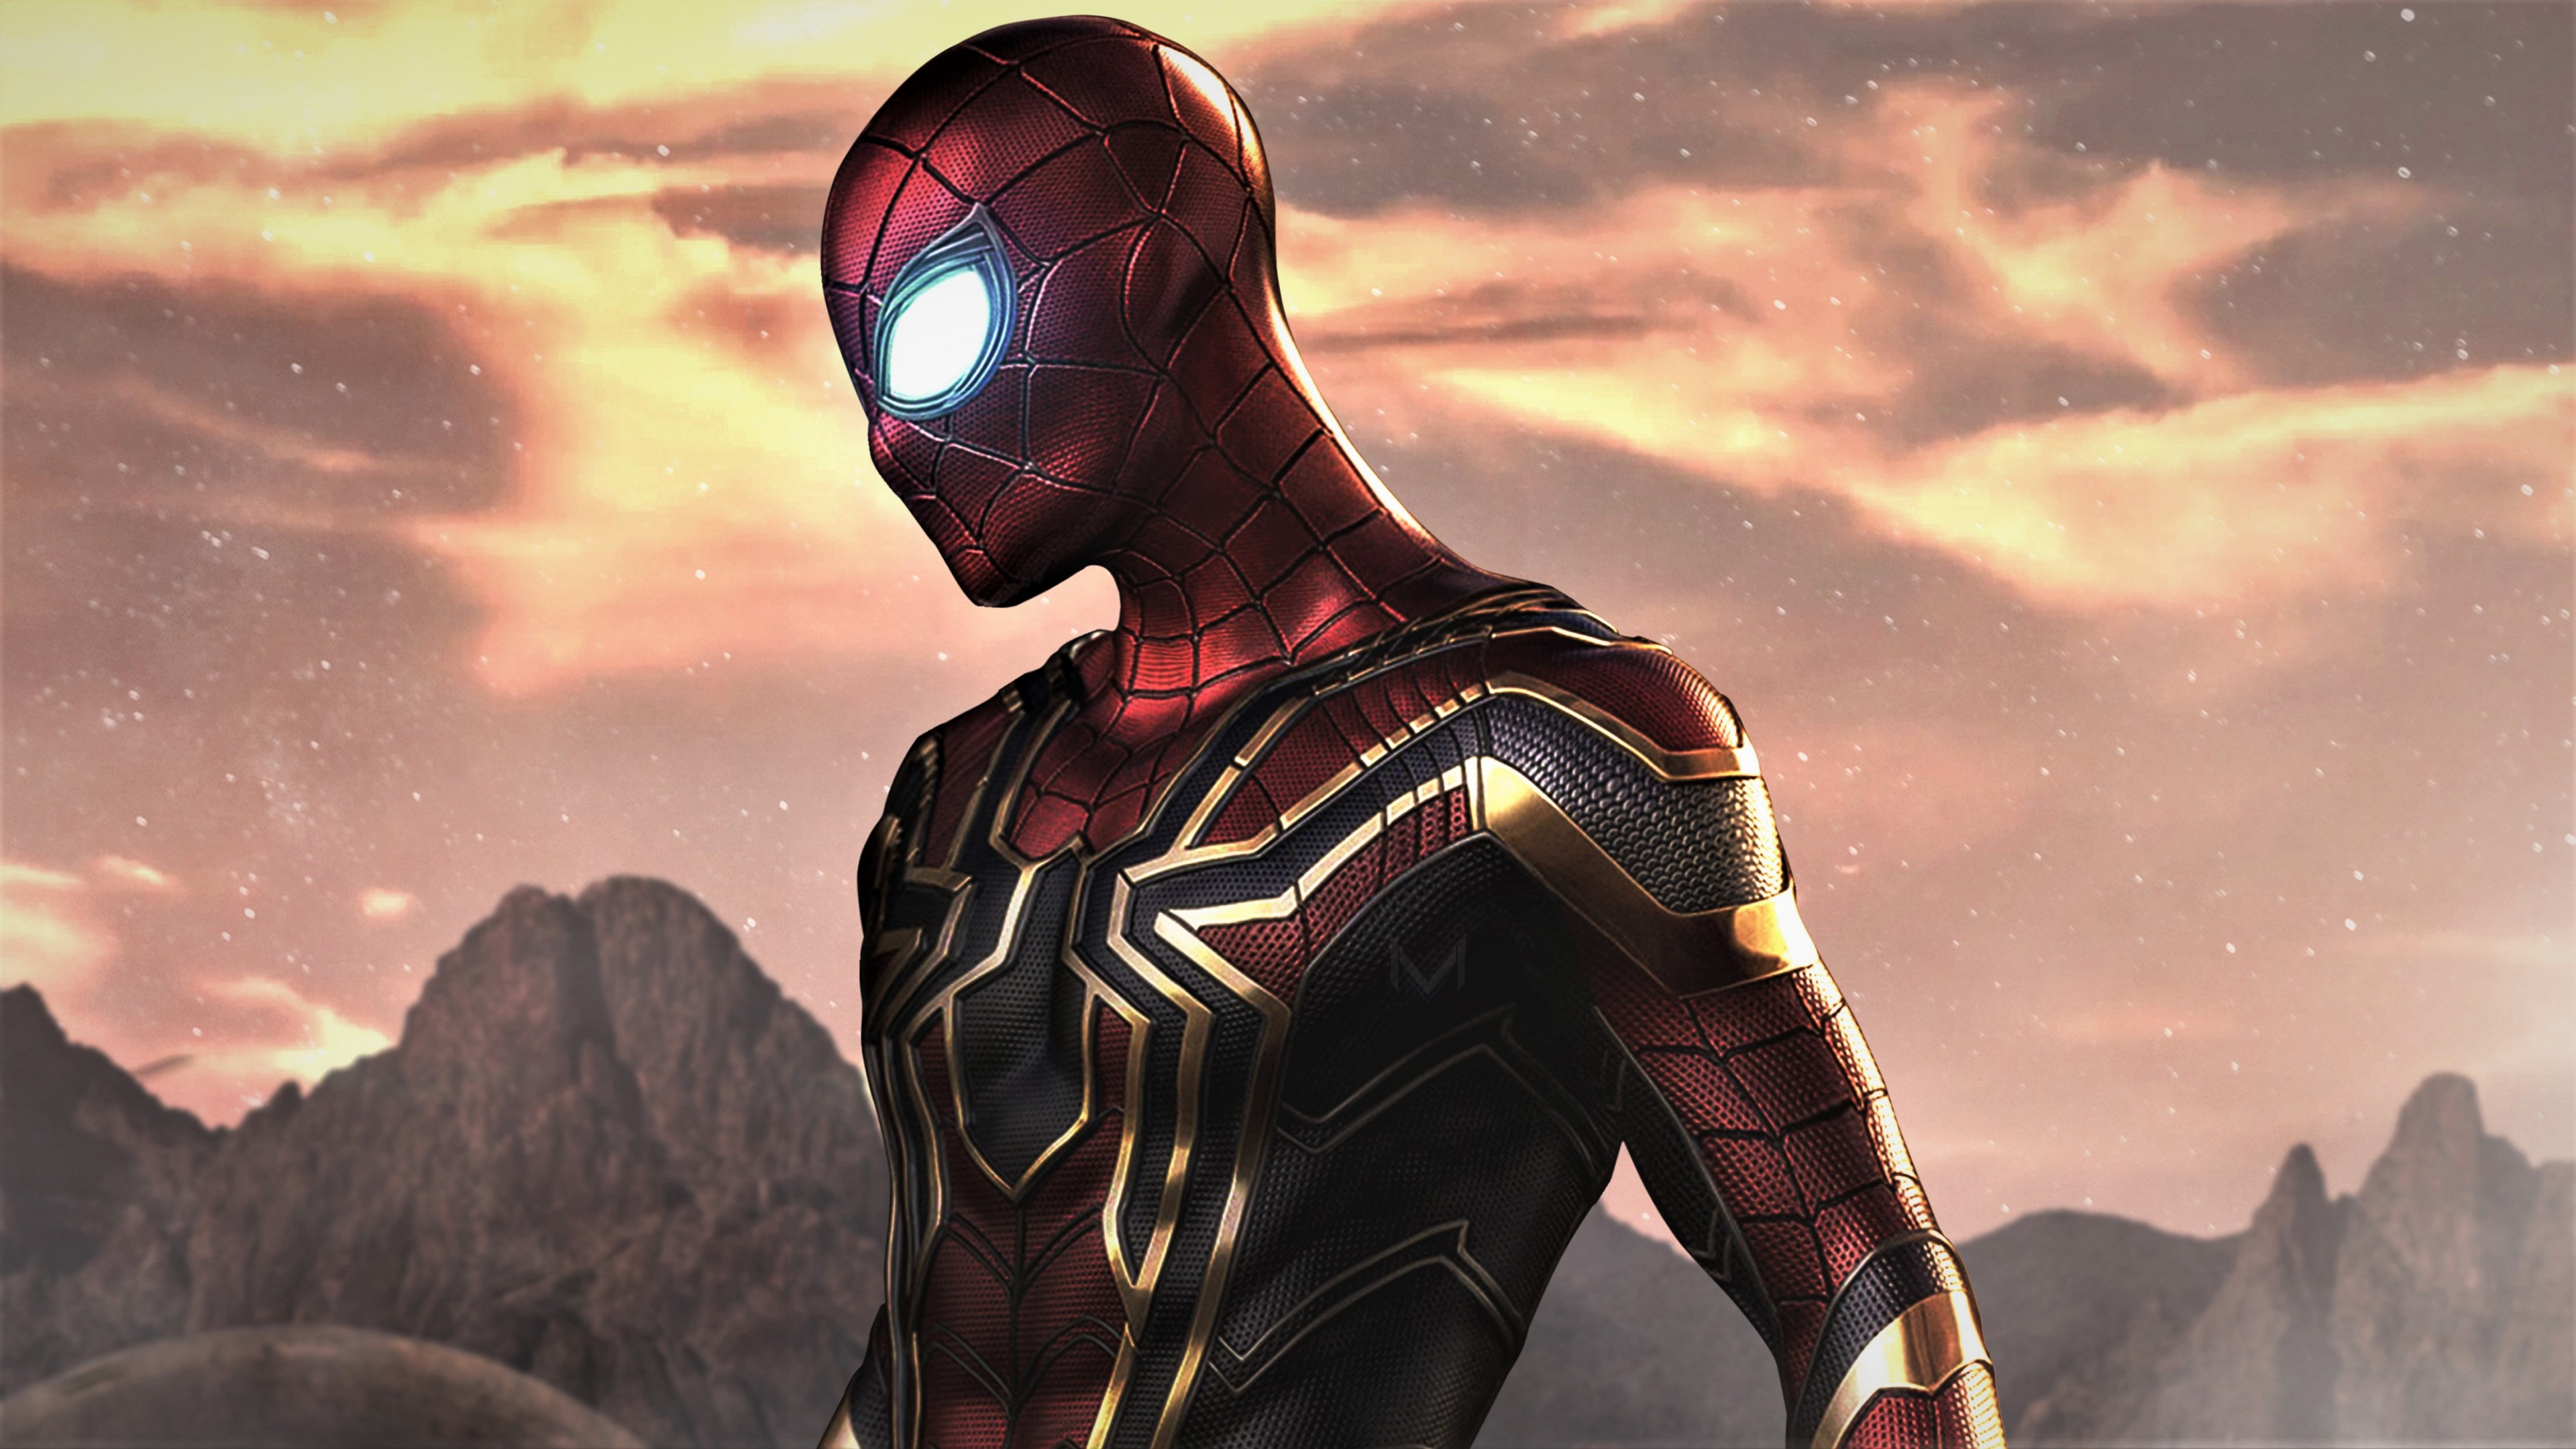 Spider Man Far From Home Wallpaper 4k Ultra Hd Id3284